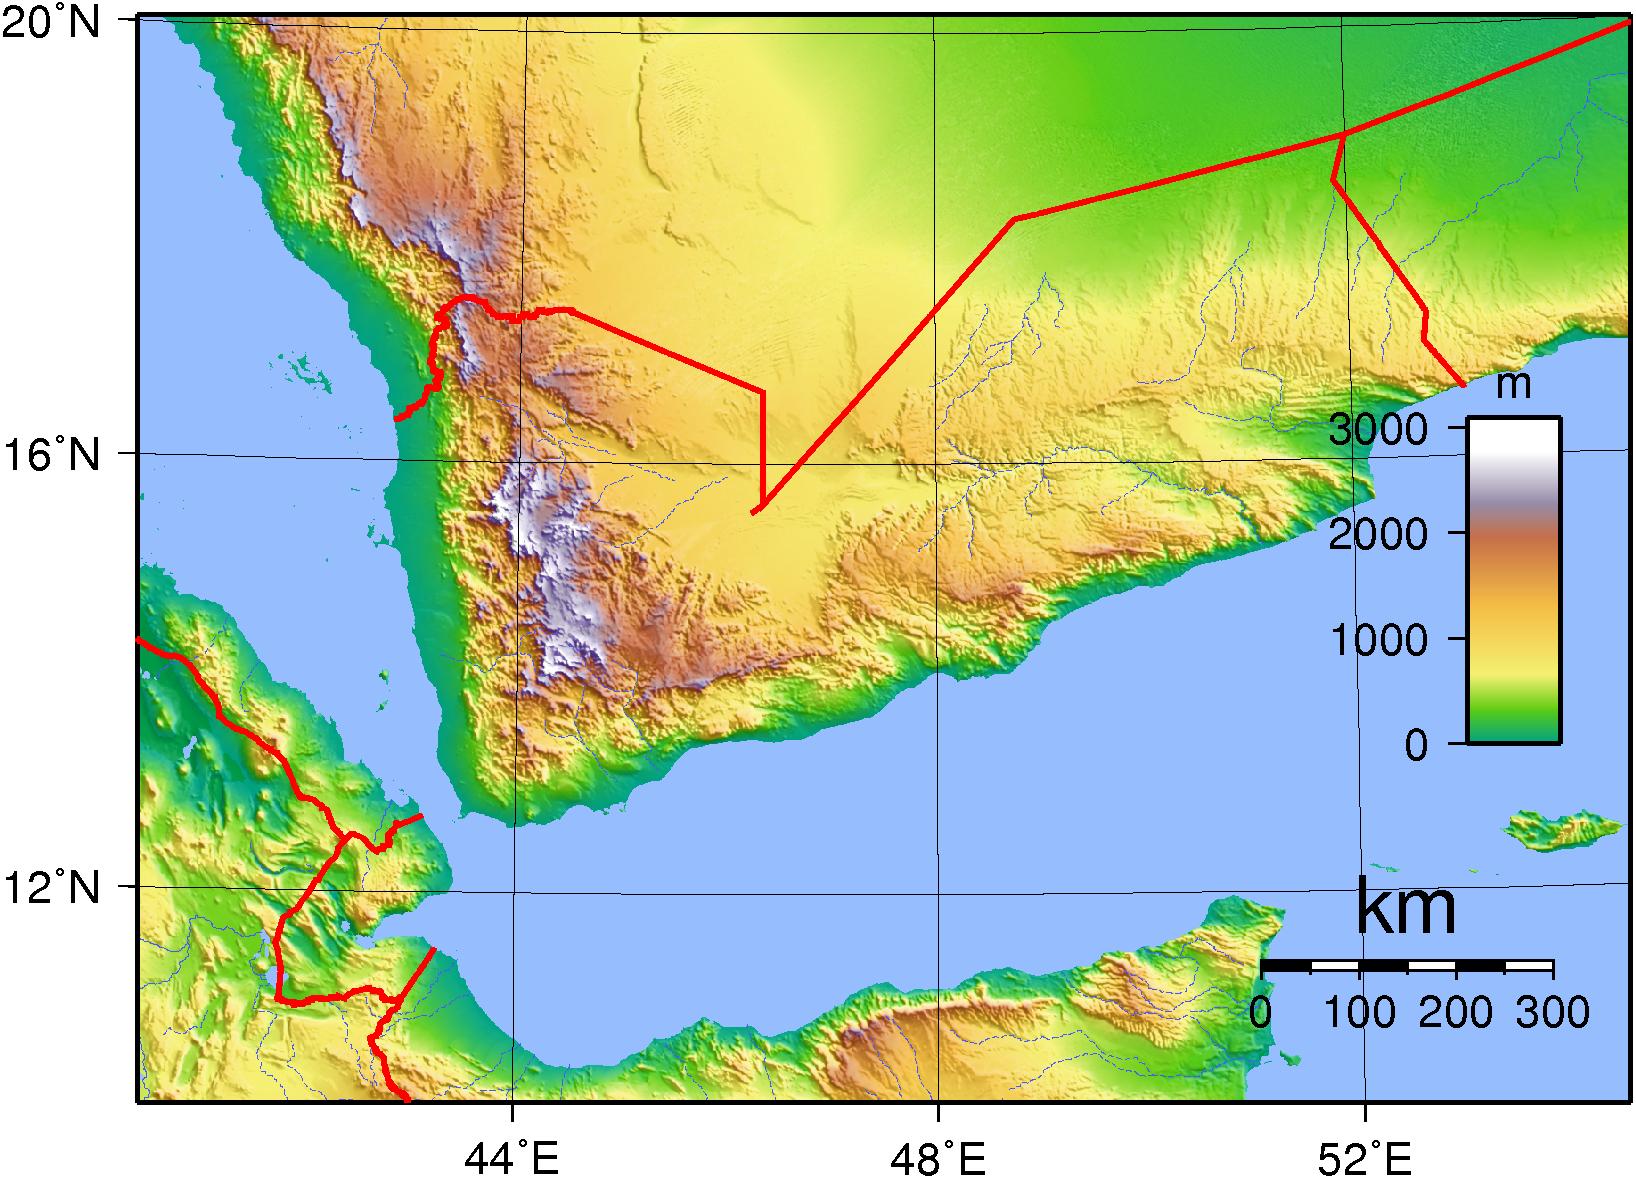 Landkarte Jemen Topographie Weltkarte Com Karten Und